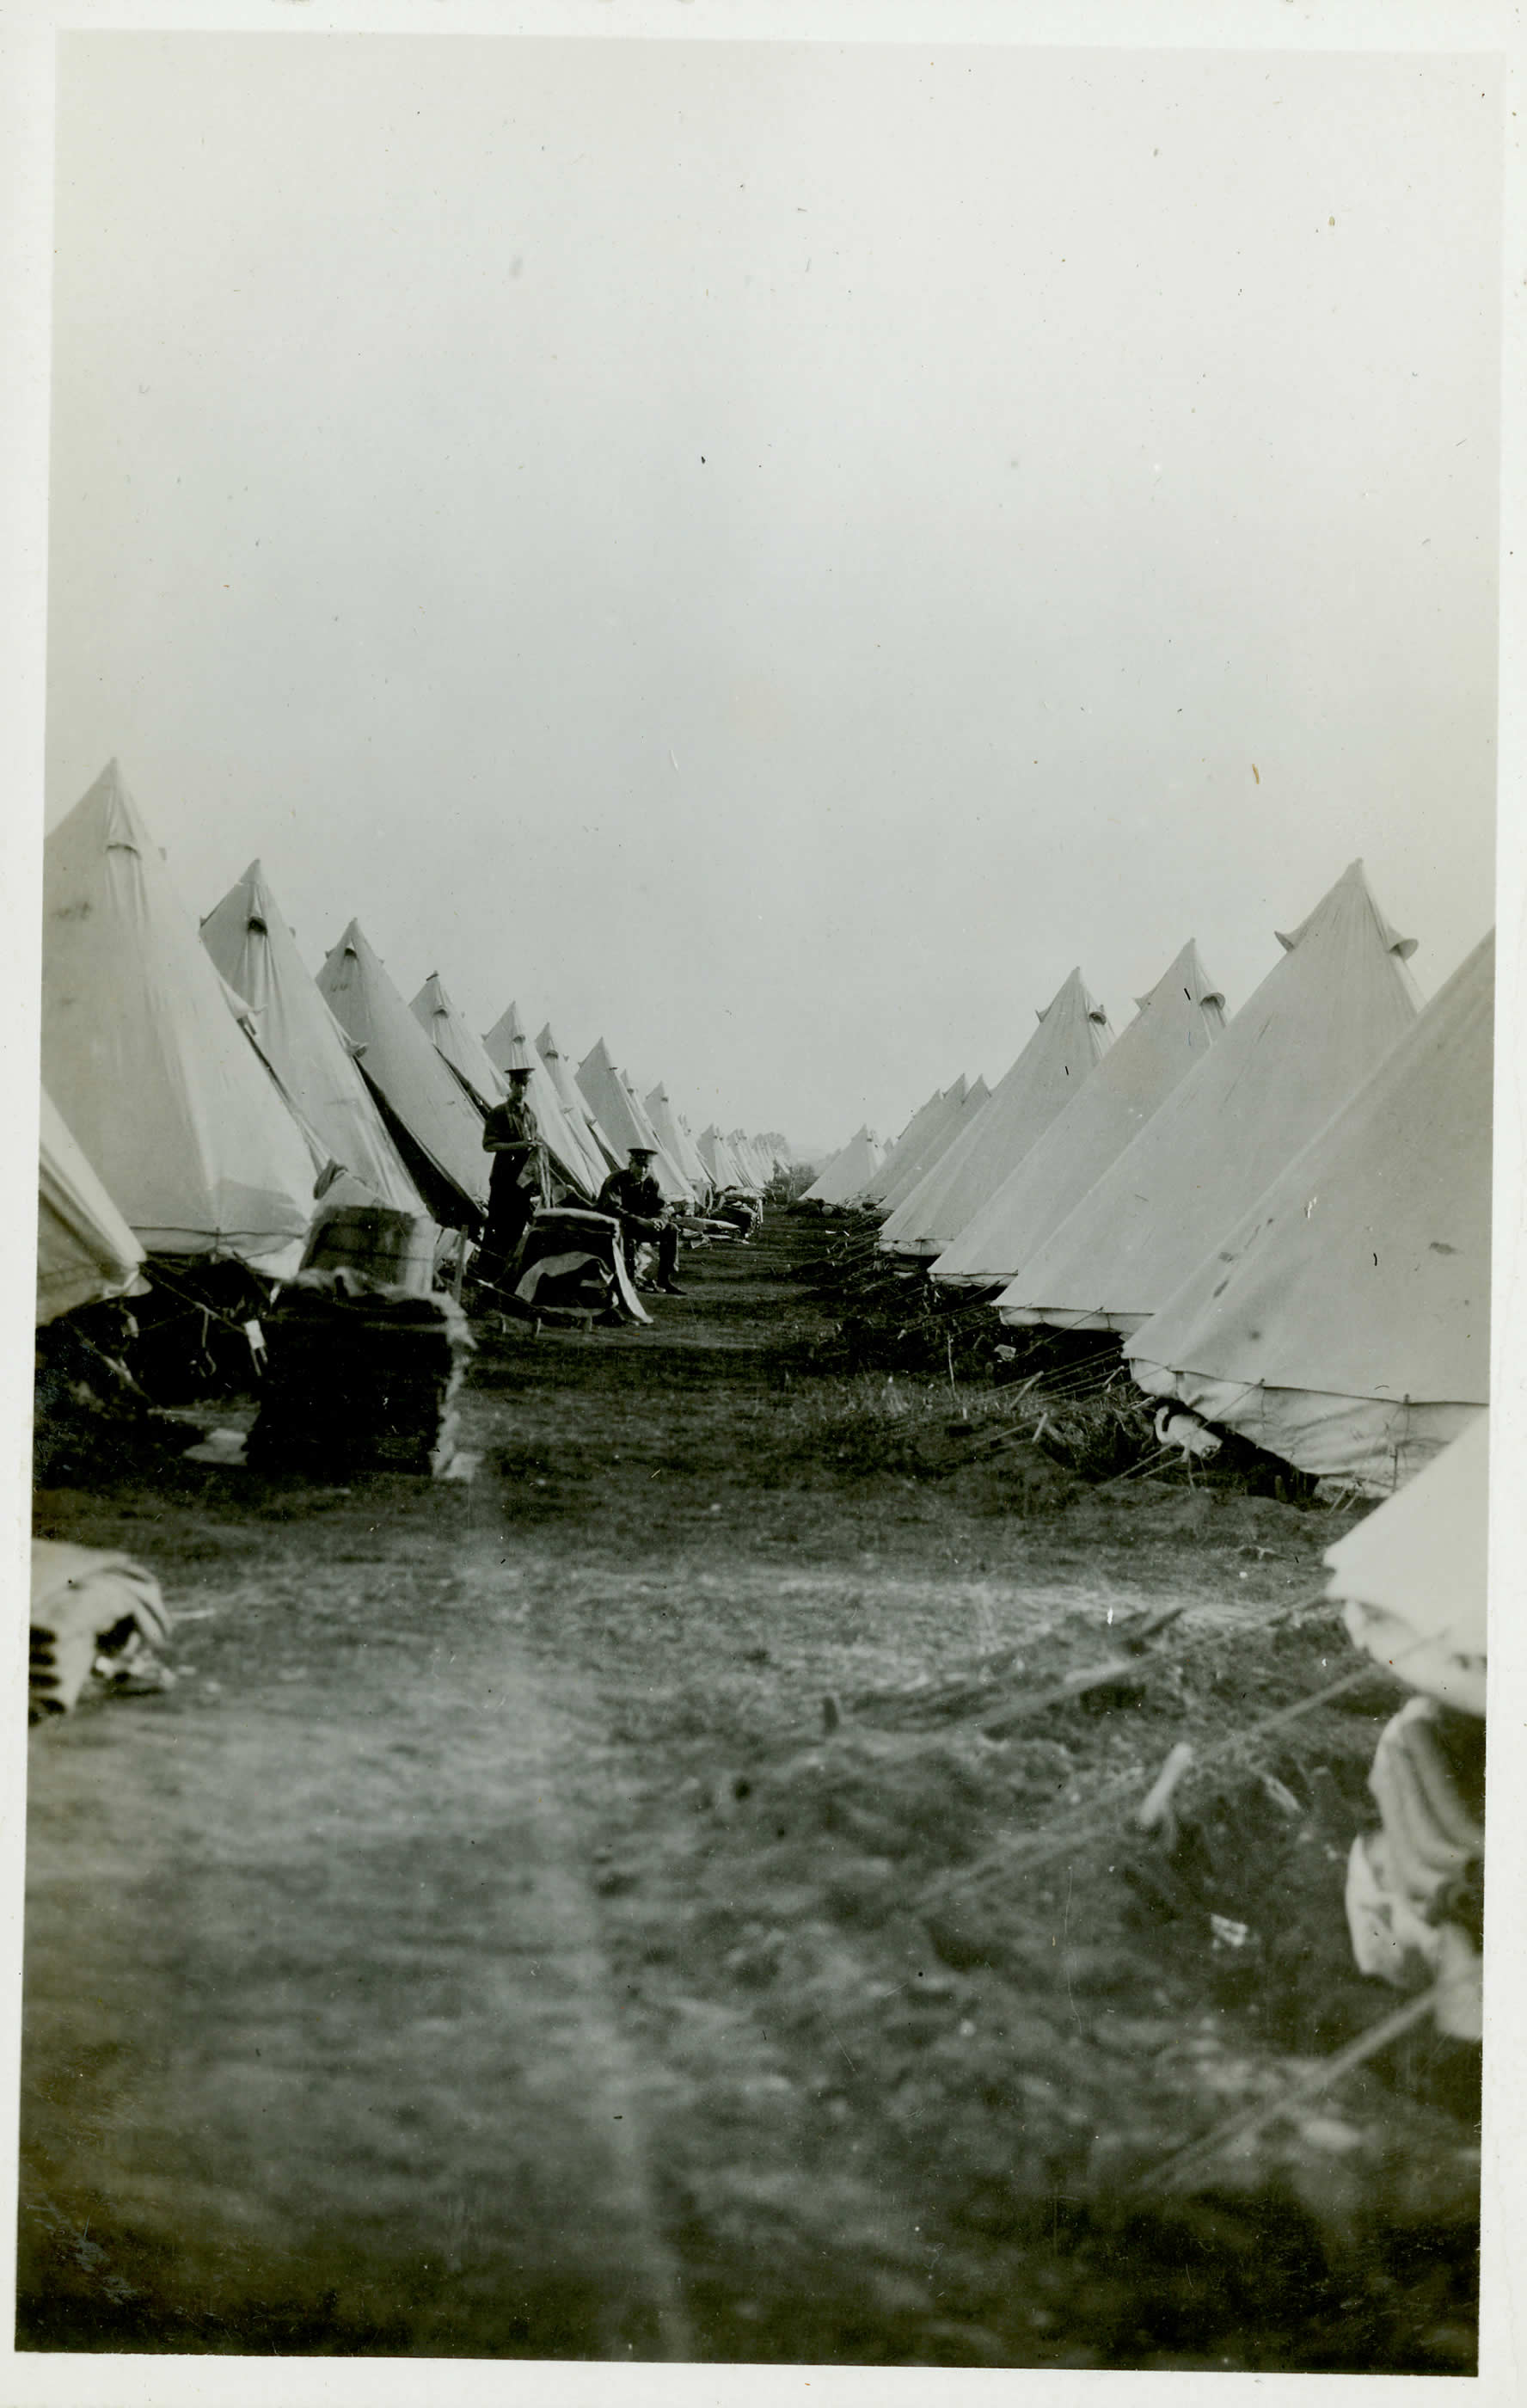 Tentes en forme de cloche au camp de Valcartier